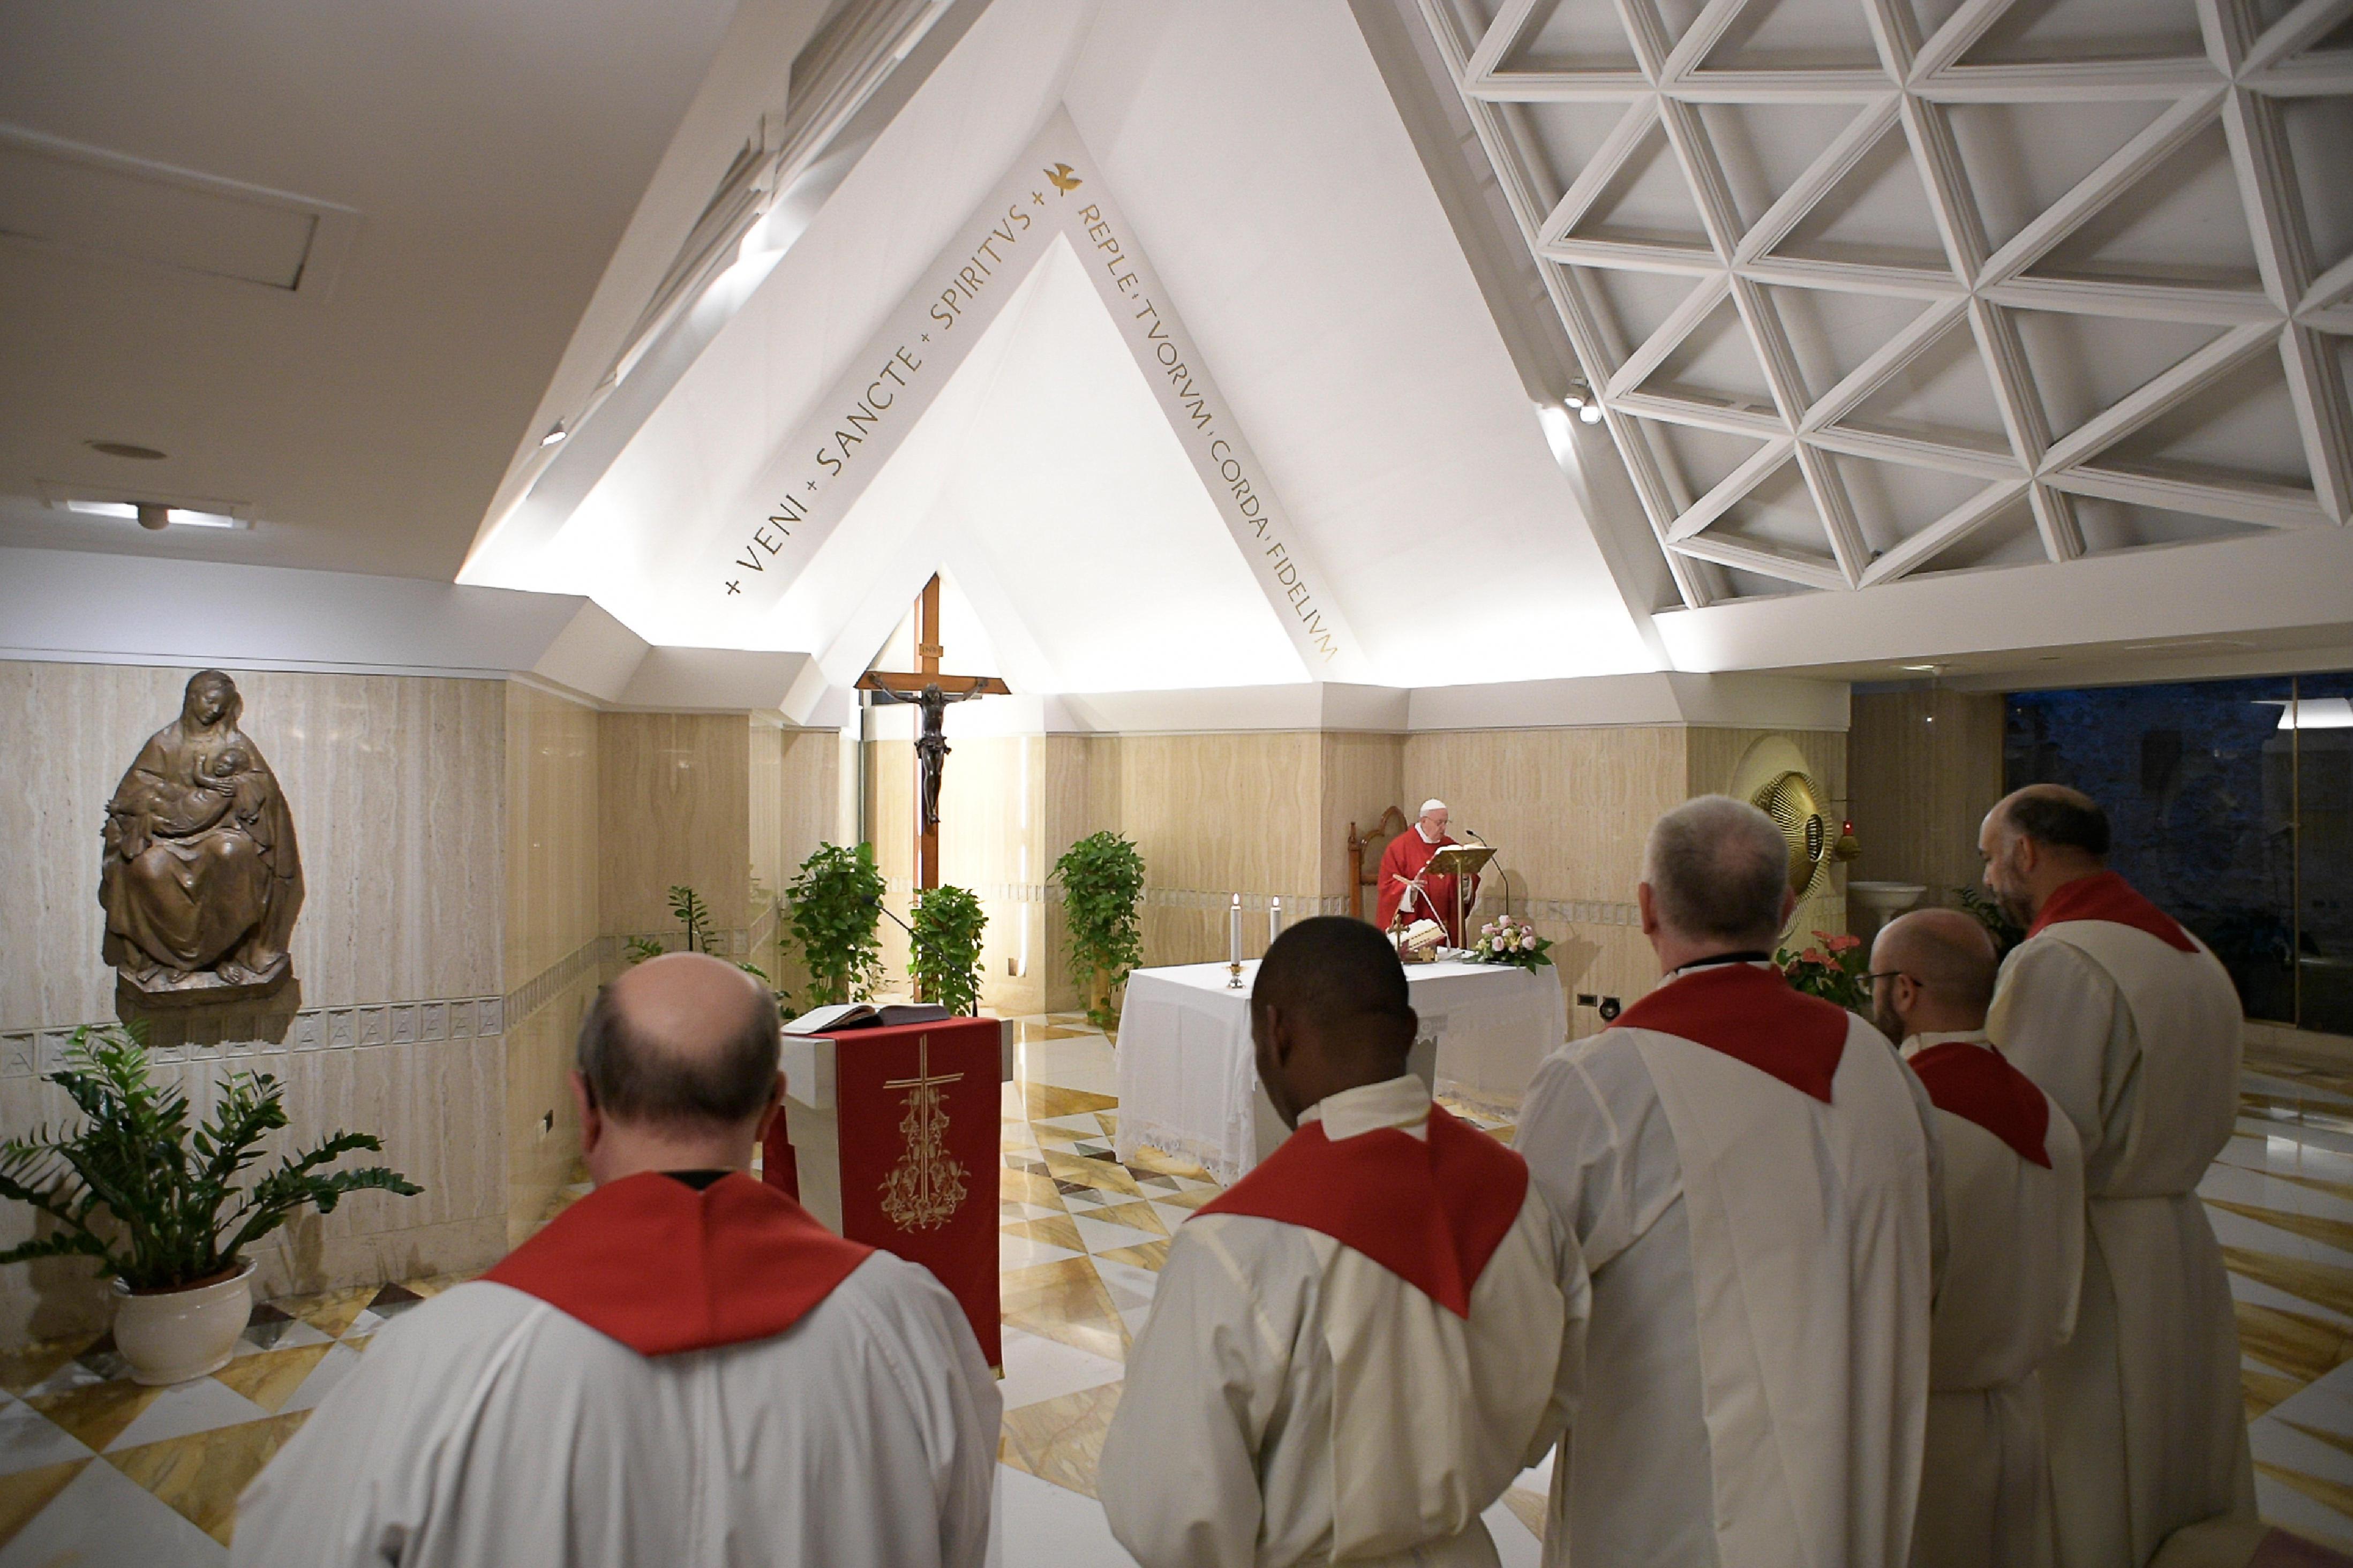 Messe à Sainte-Marthe, 12 novembre 2019 © Vatican Media